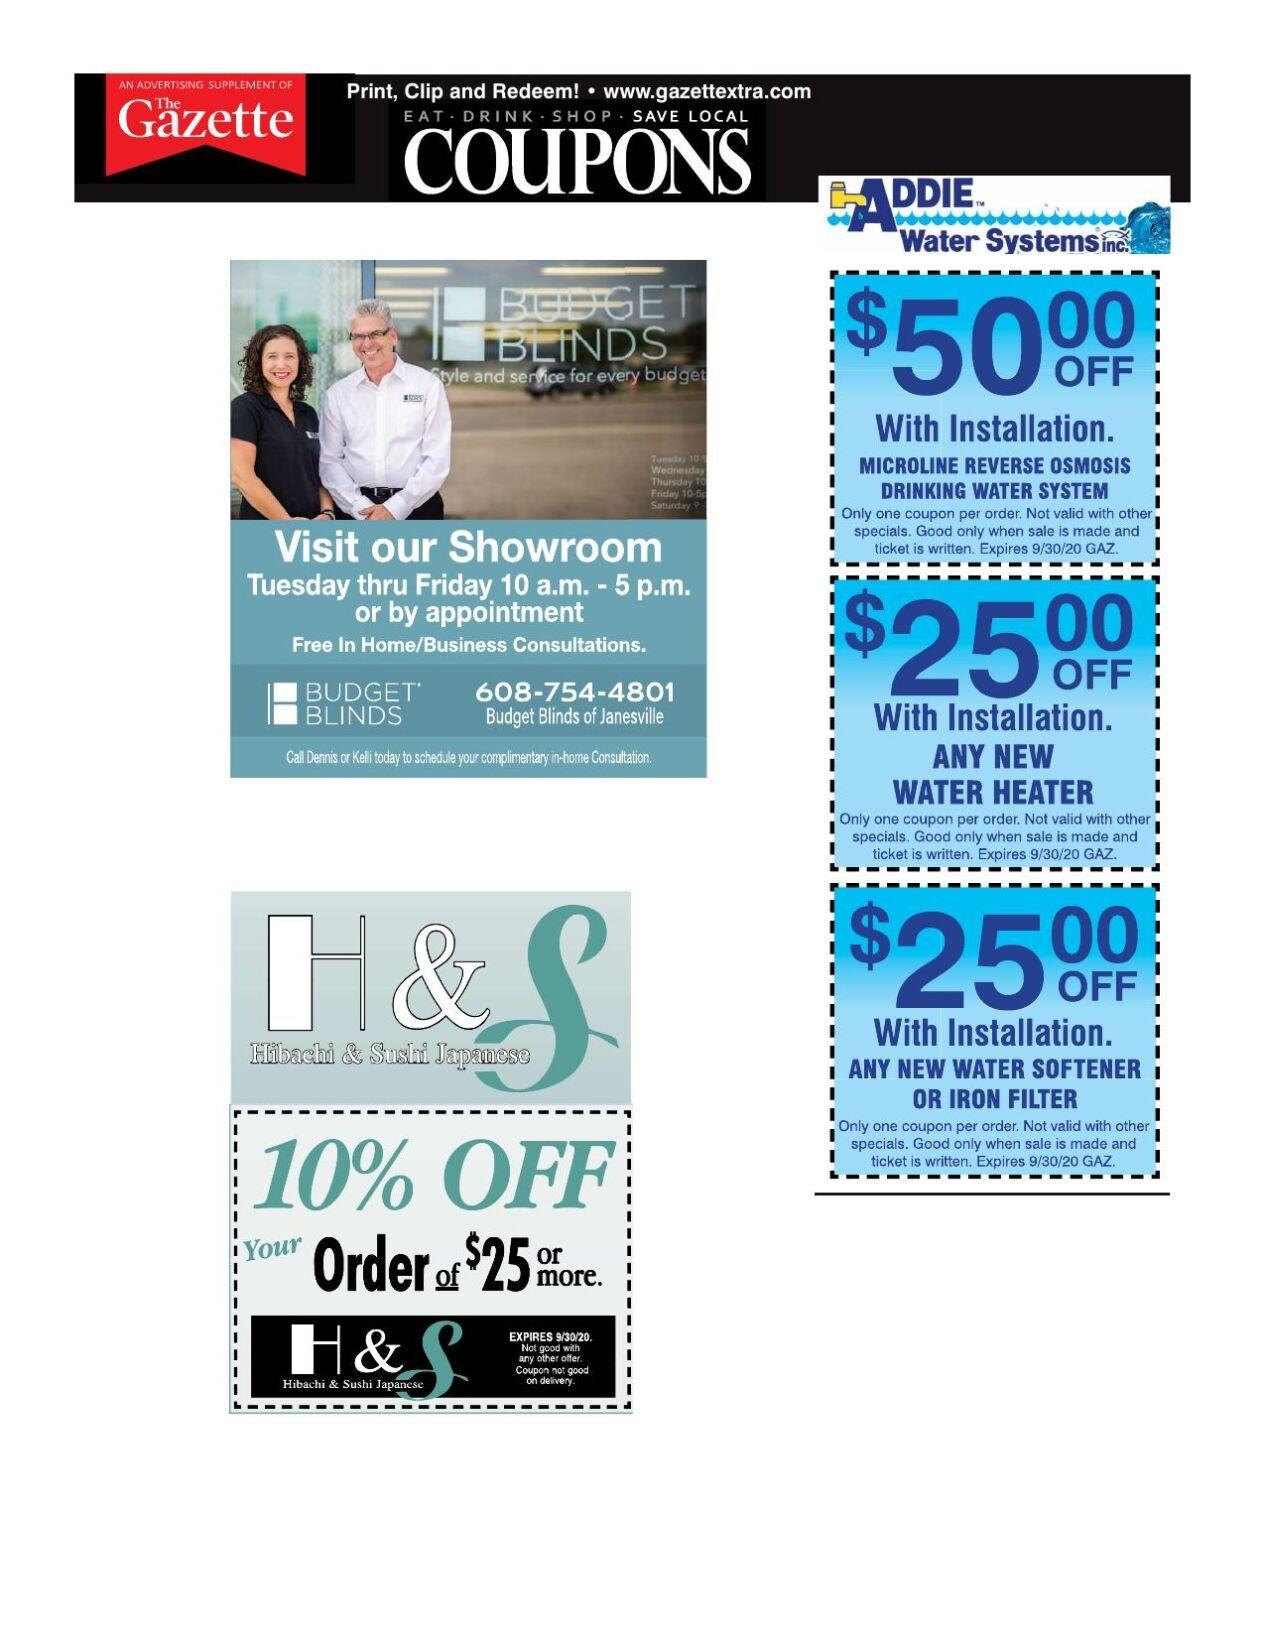 Gazette coupons